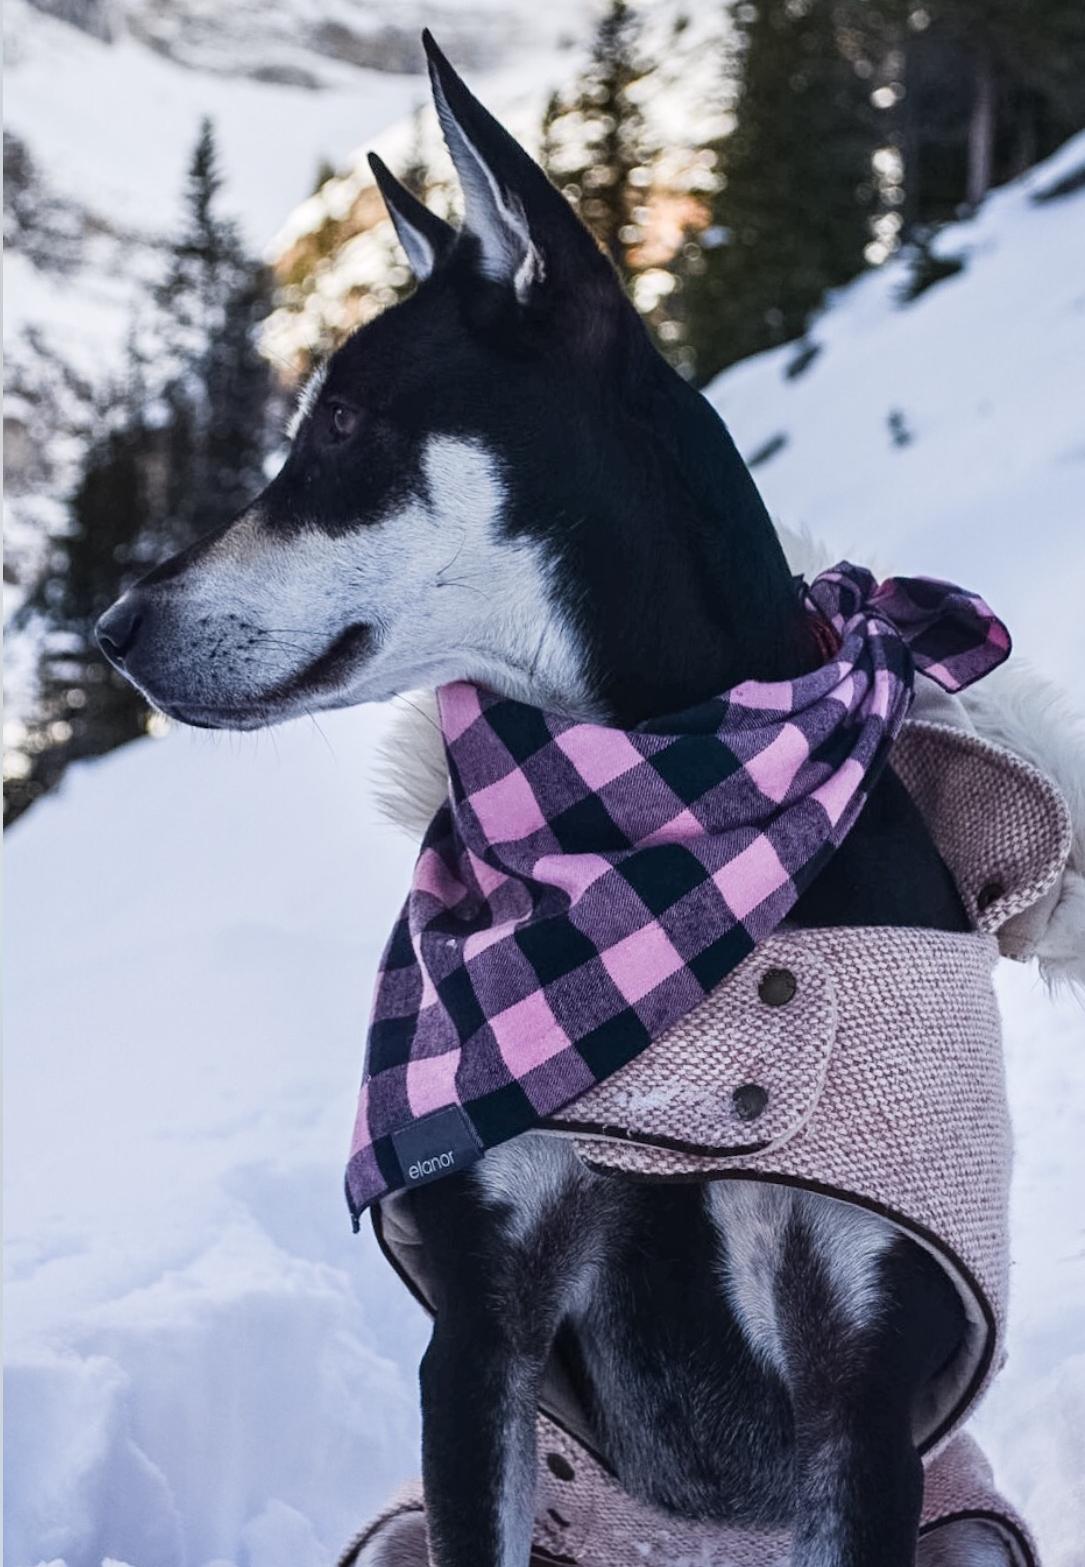 elanor bandana and coat on Holly